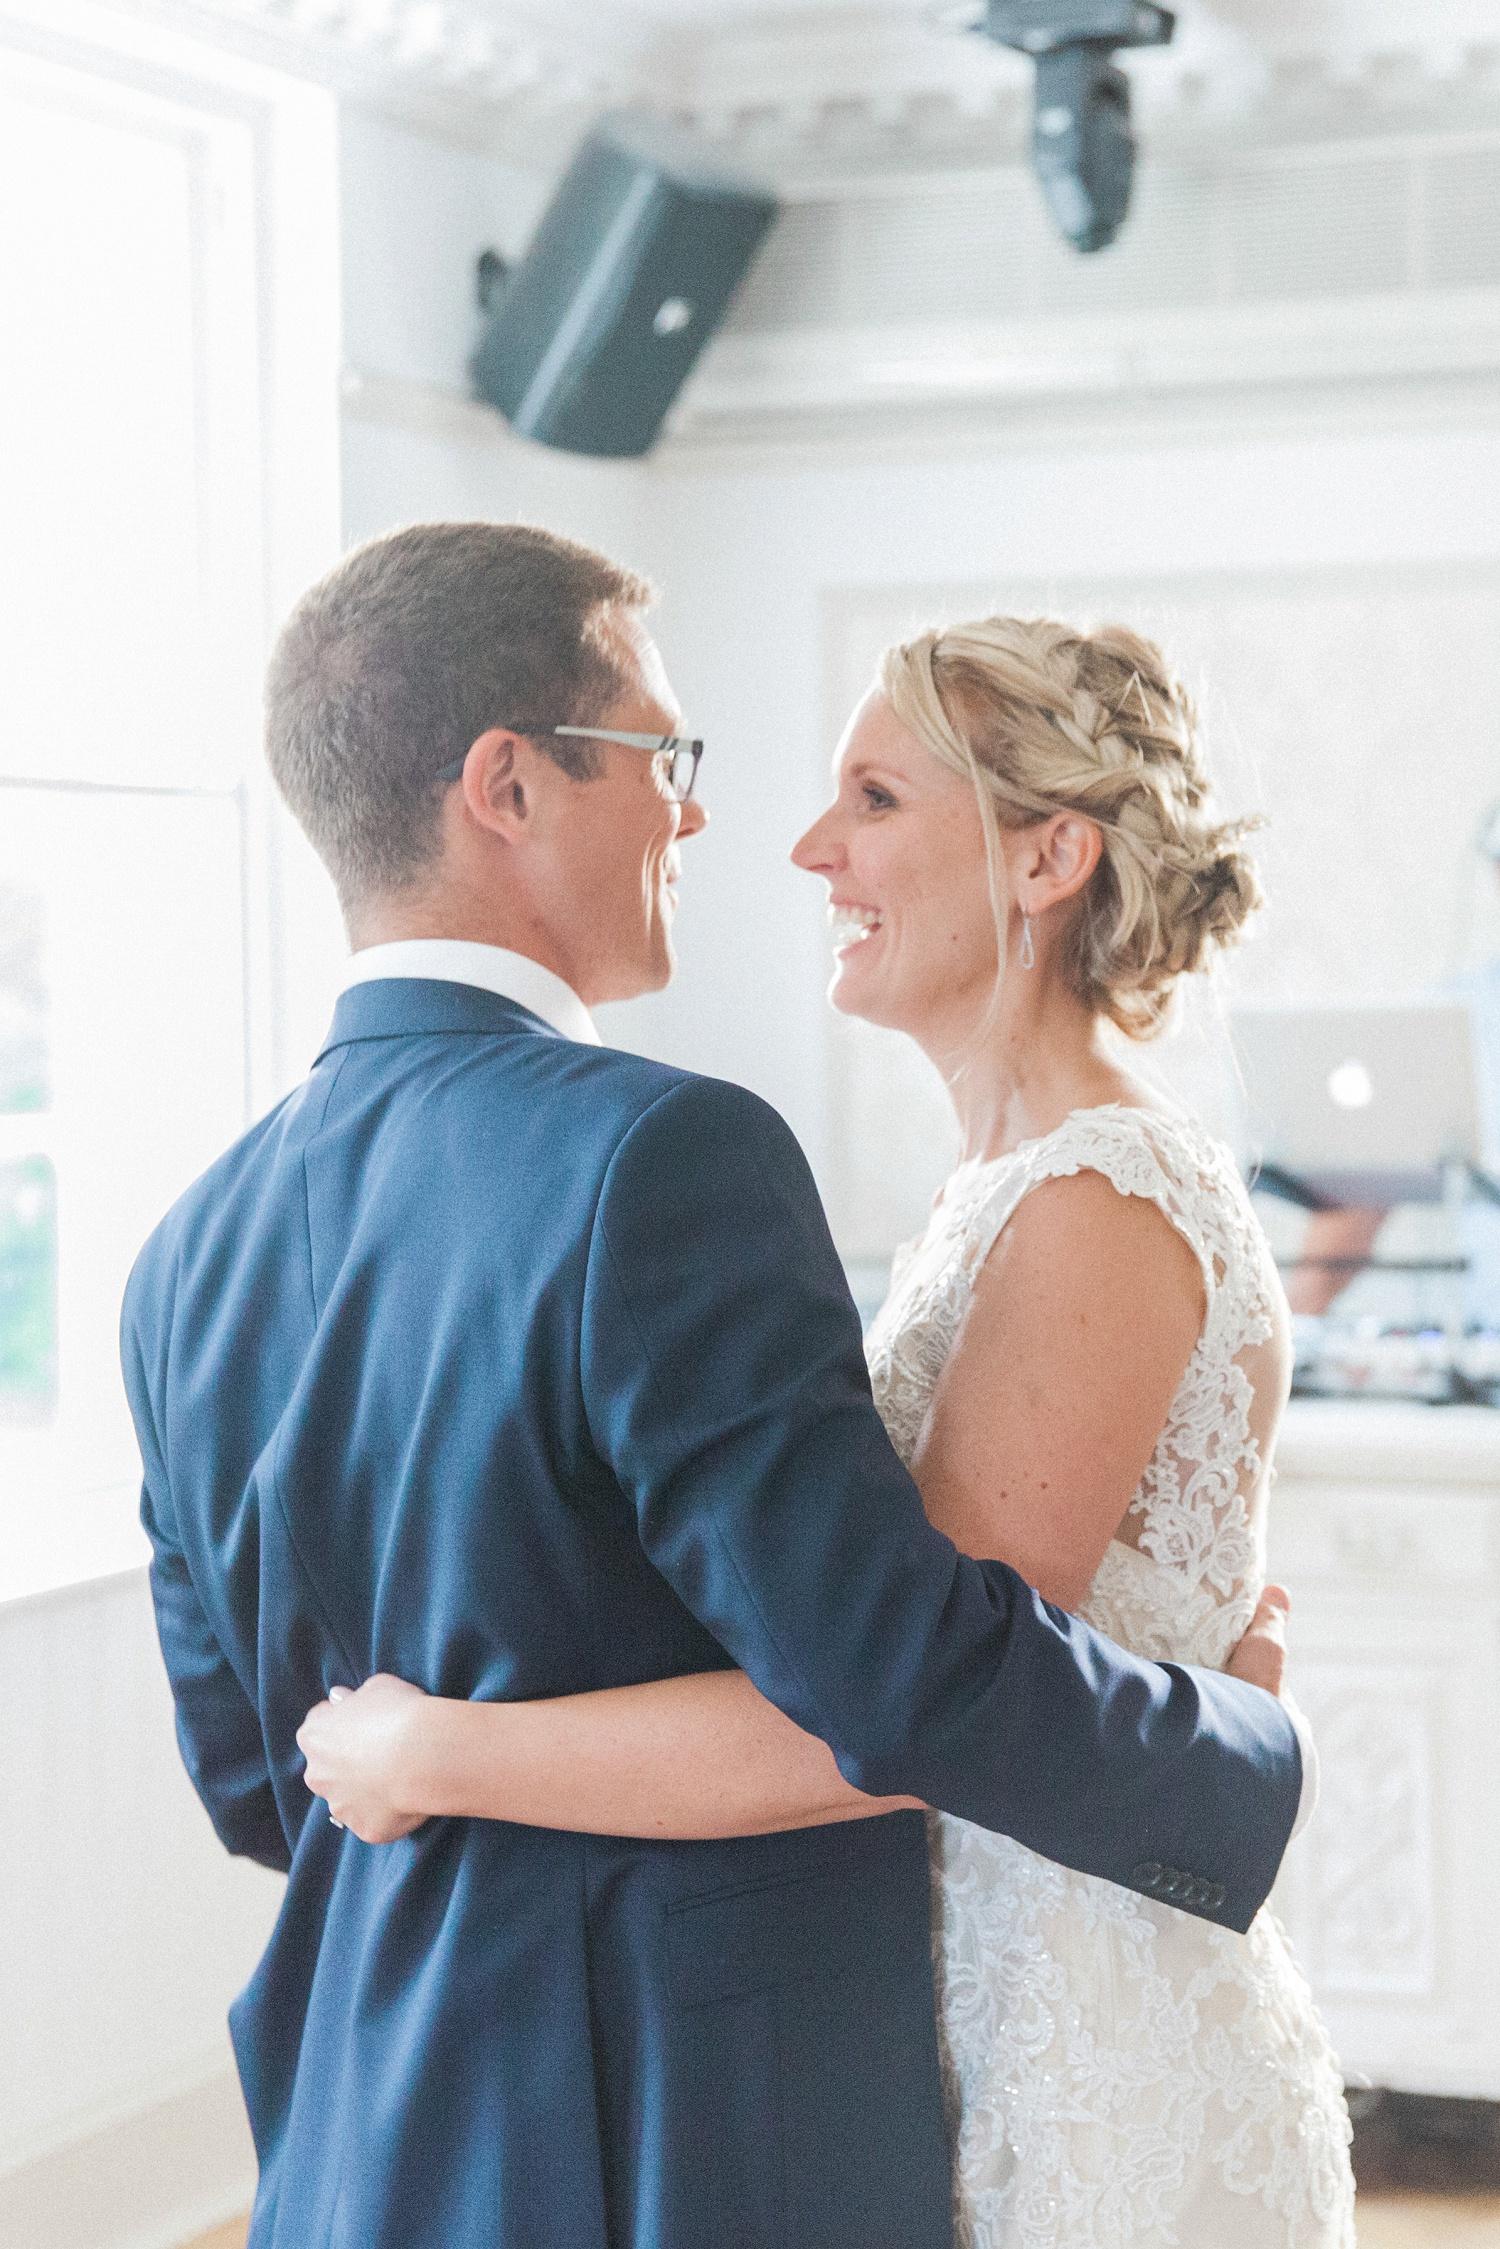 London wedding photographer testimonial